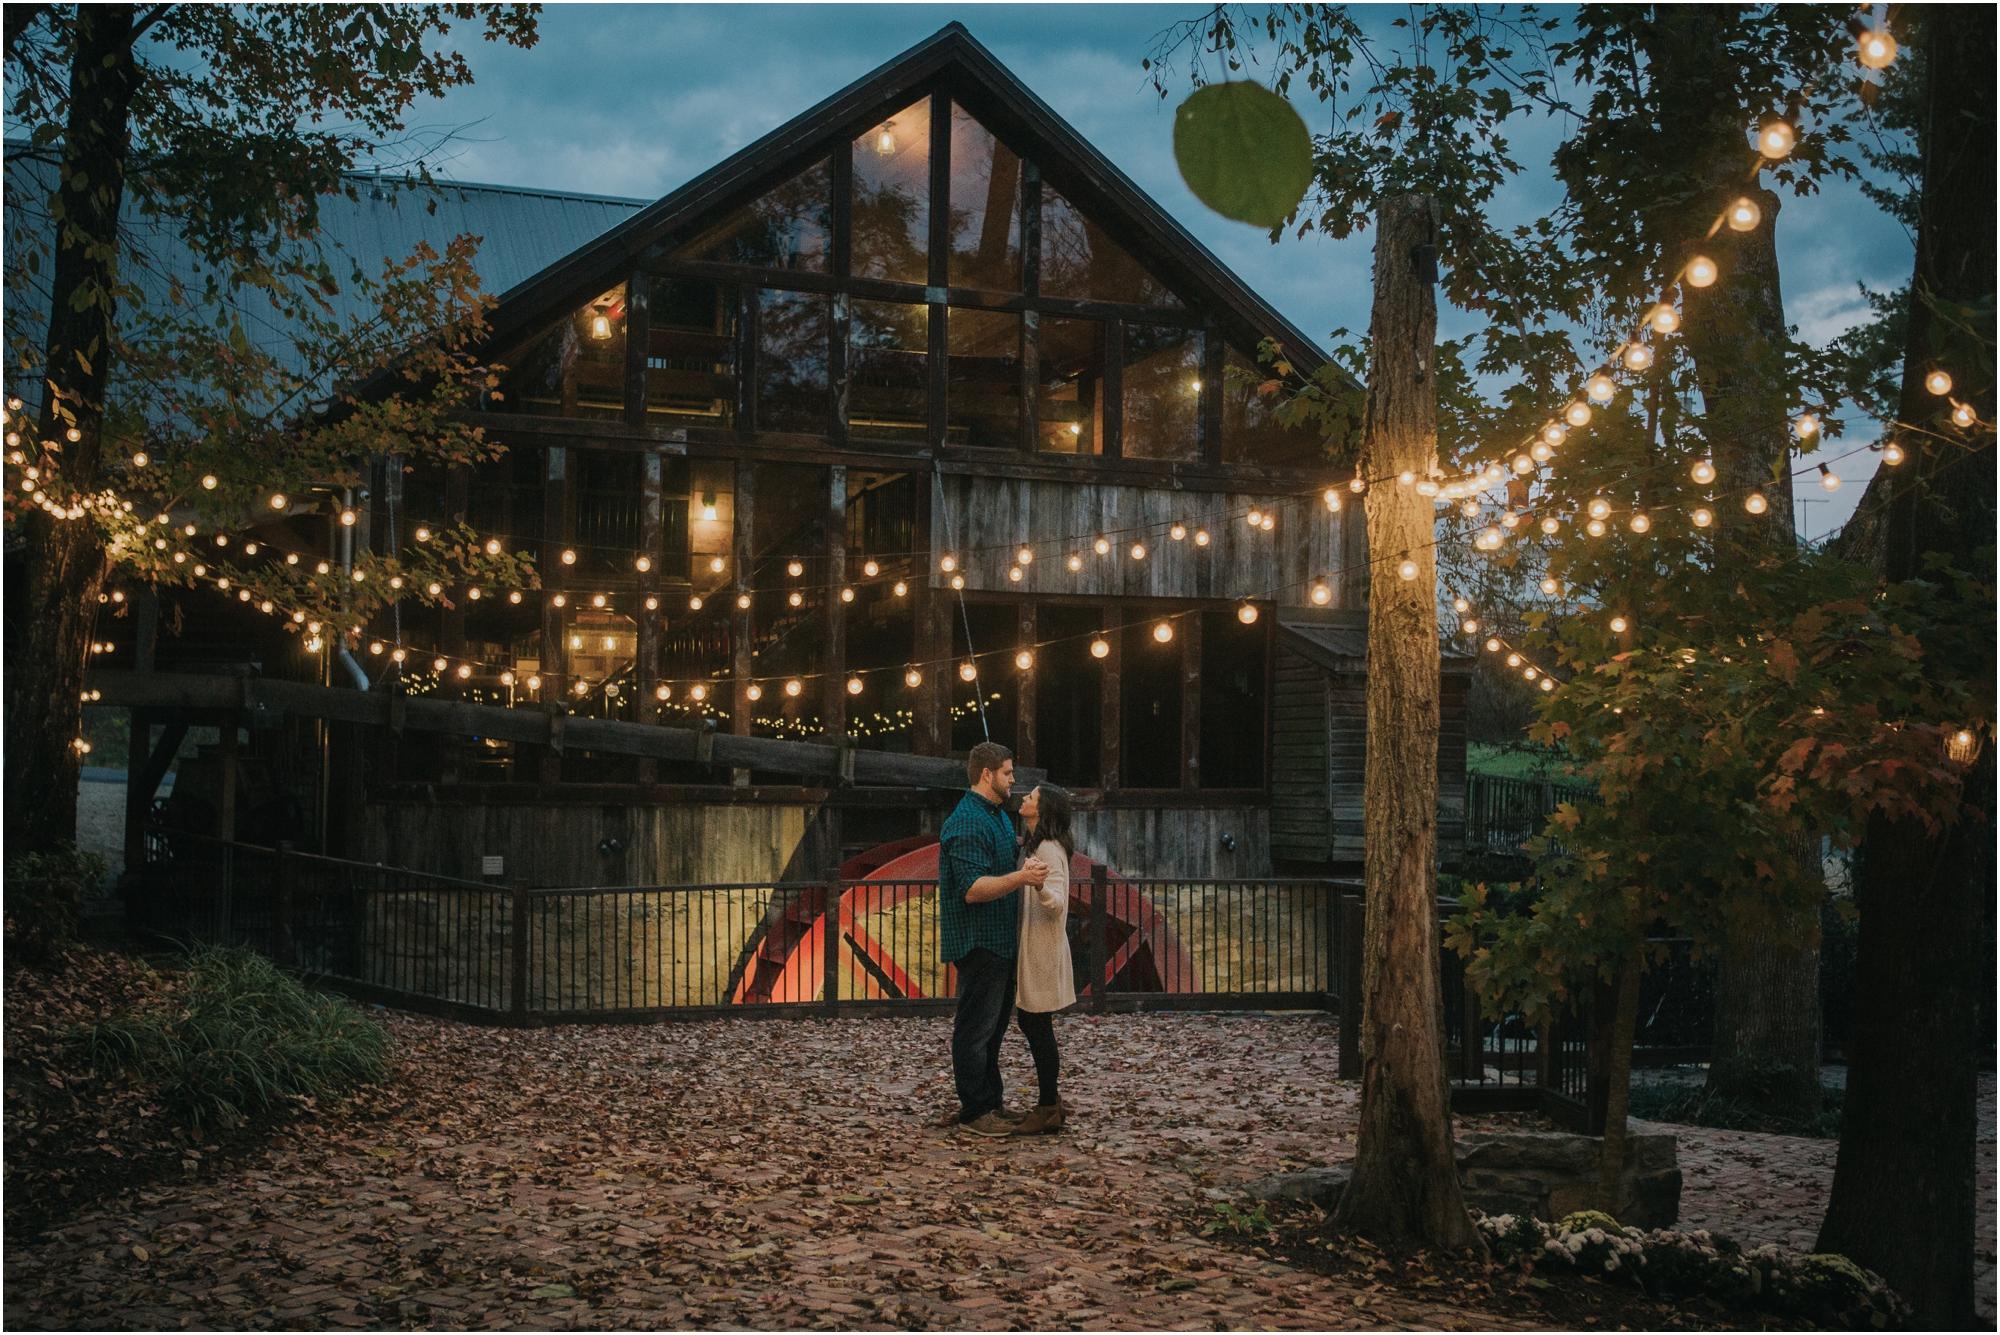 katy-sergent-millstone-limestone-tn-rustic-fall-engagement-session-adventurous-outdoors-intimate-elopement-wedding-northeast-johnson-city-photographer_0040.jpg